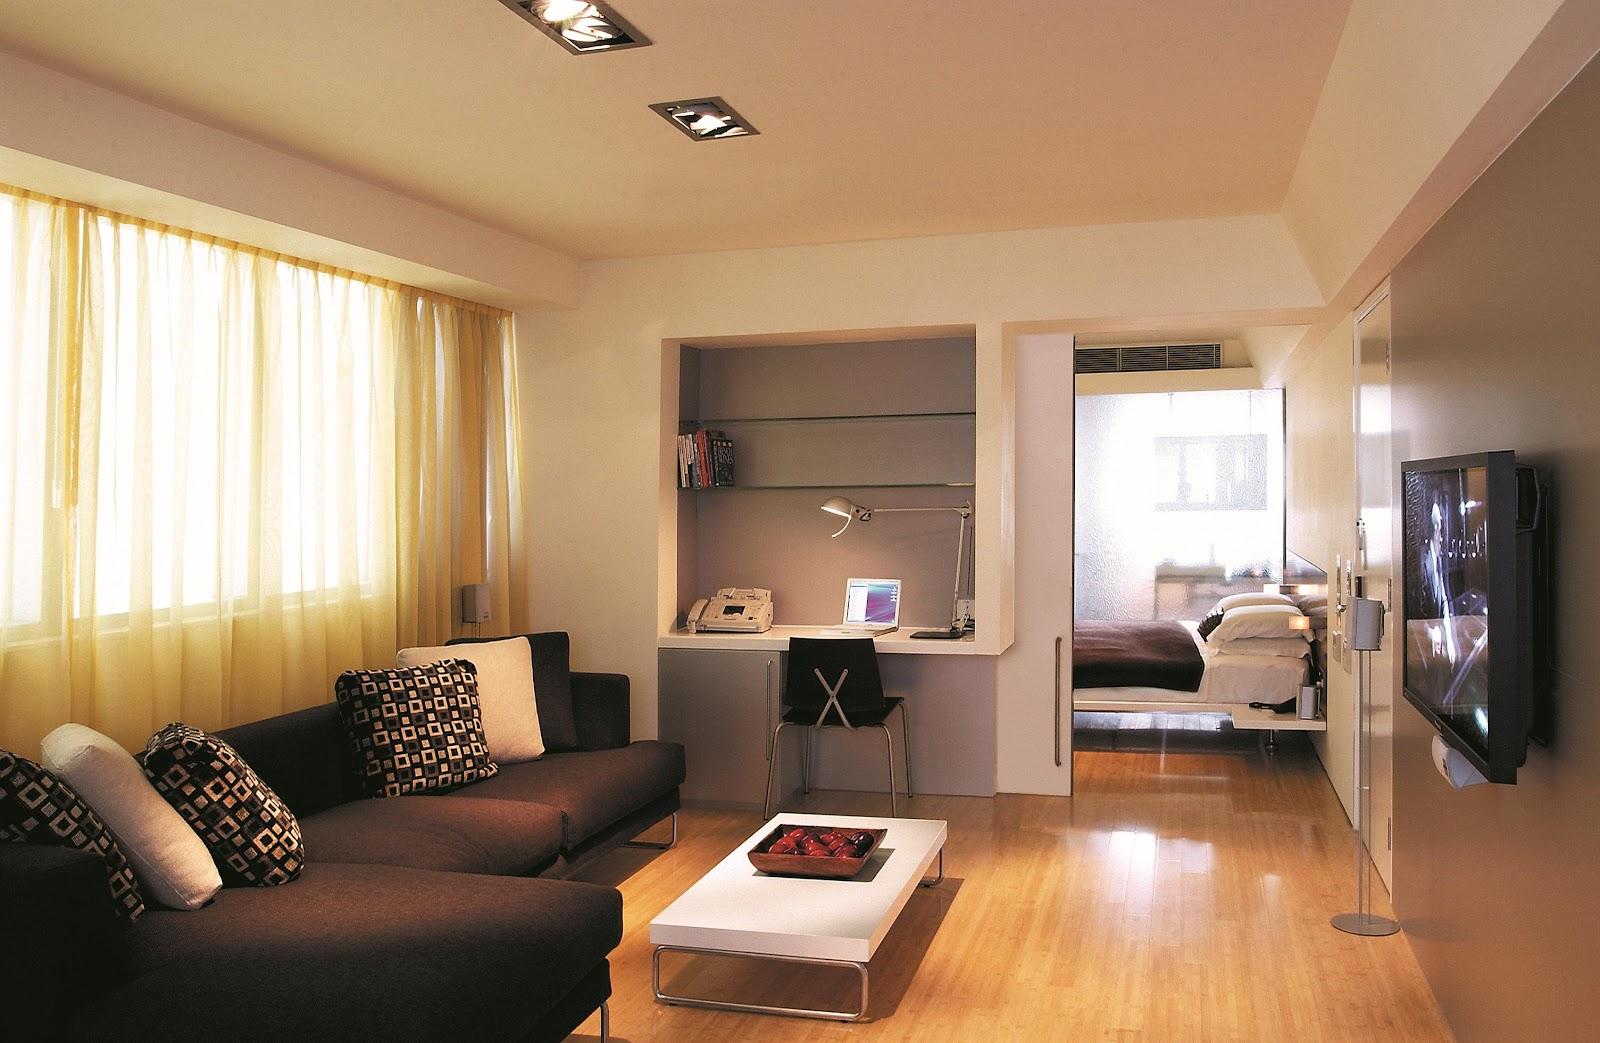 Living room, curtains, sofa, living space, interior